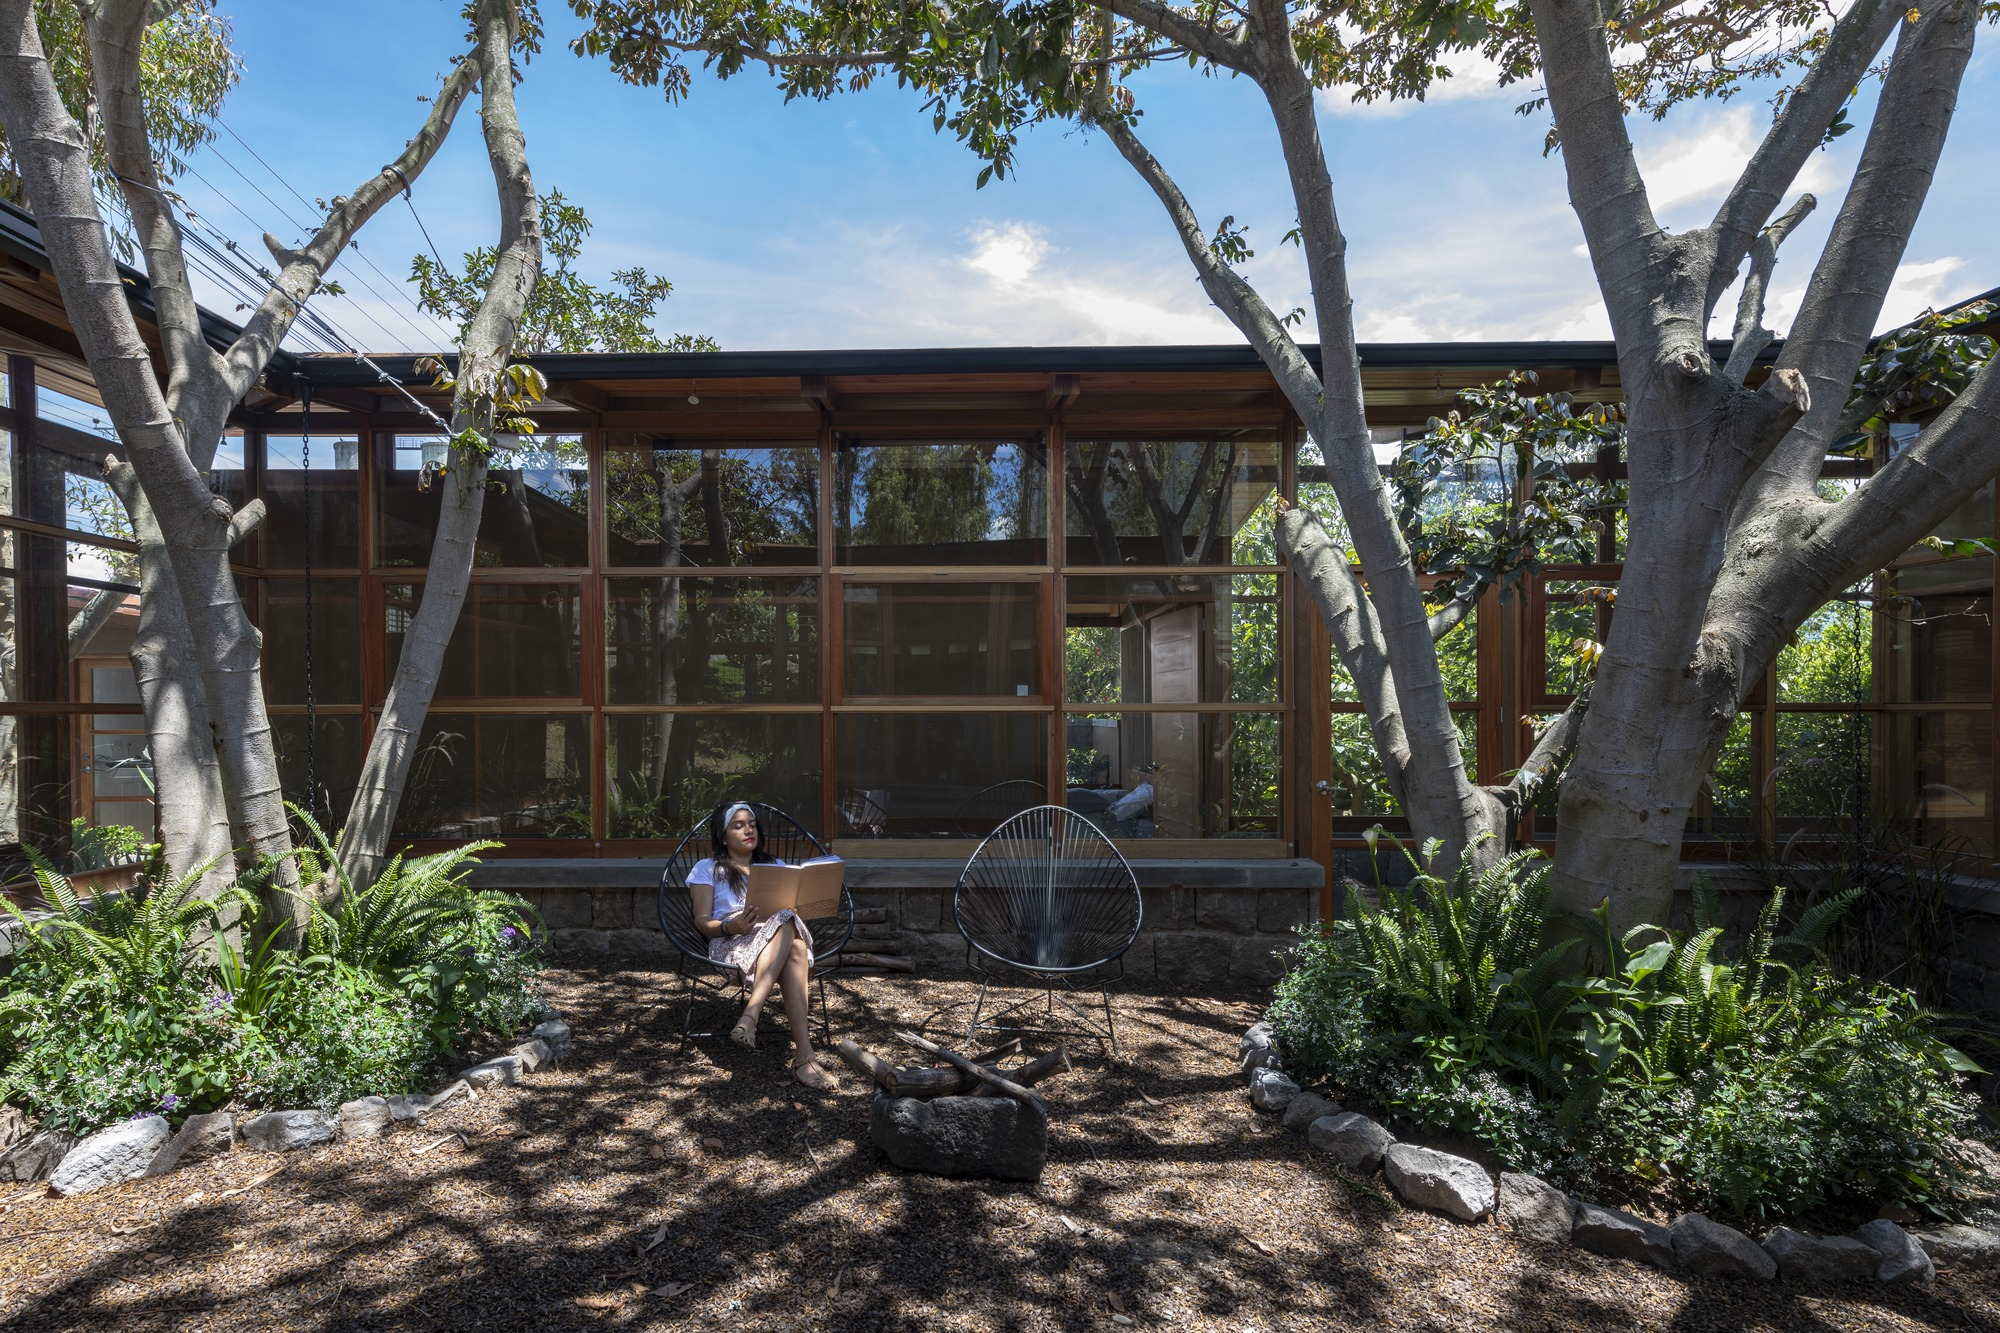 House Among Trees / El Sindicato Arquitectura